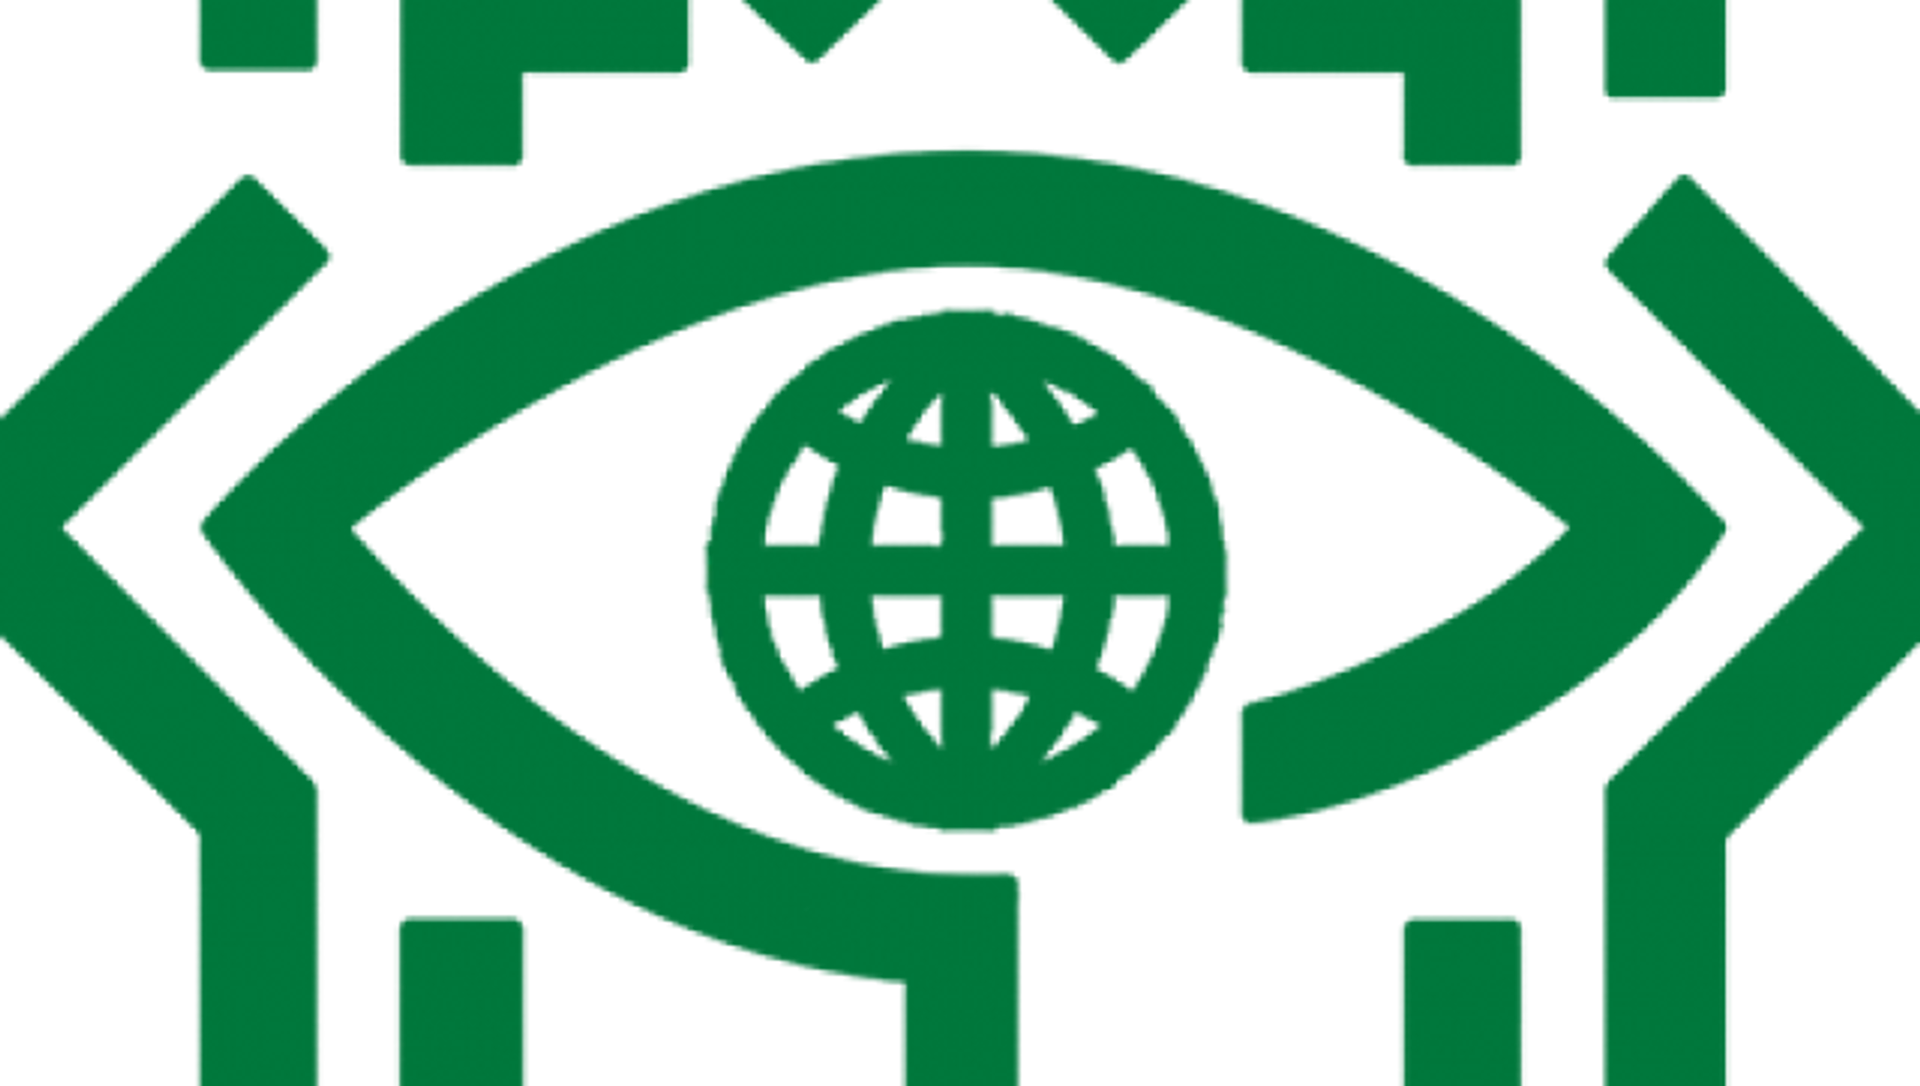 Logo for Iran's Ministry of Intelligence. - Sputnik International, 1920, 27.07.2021